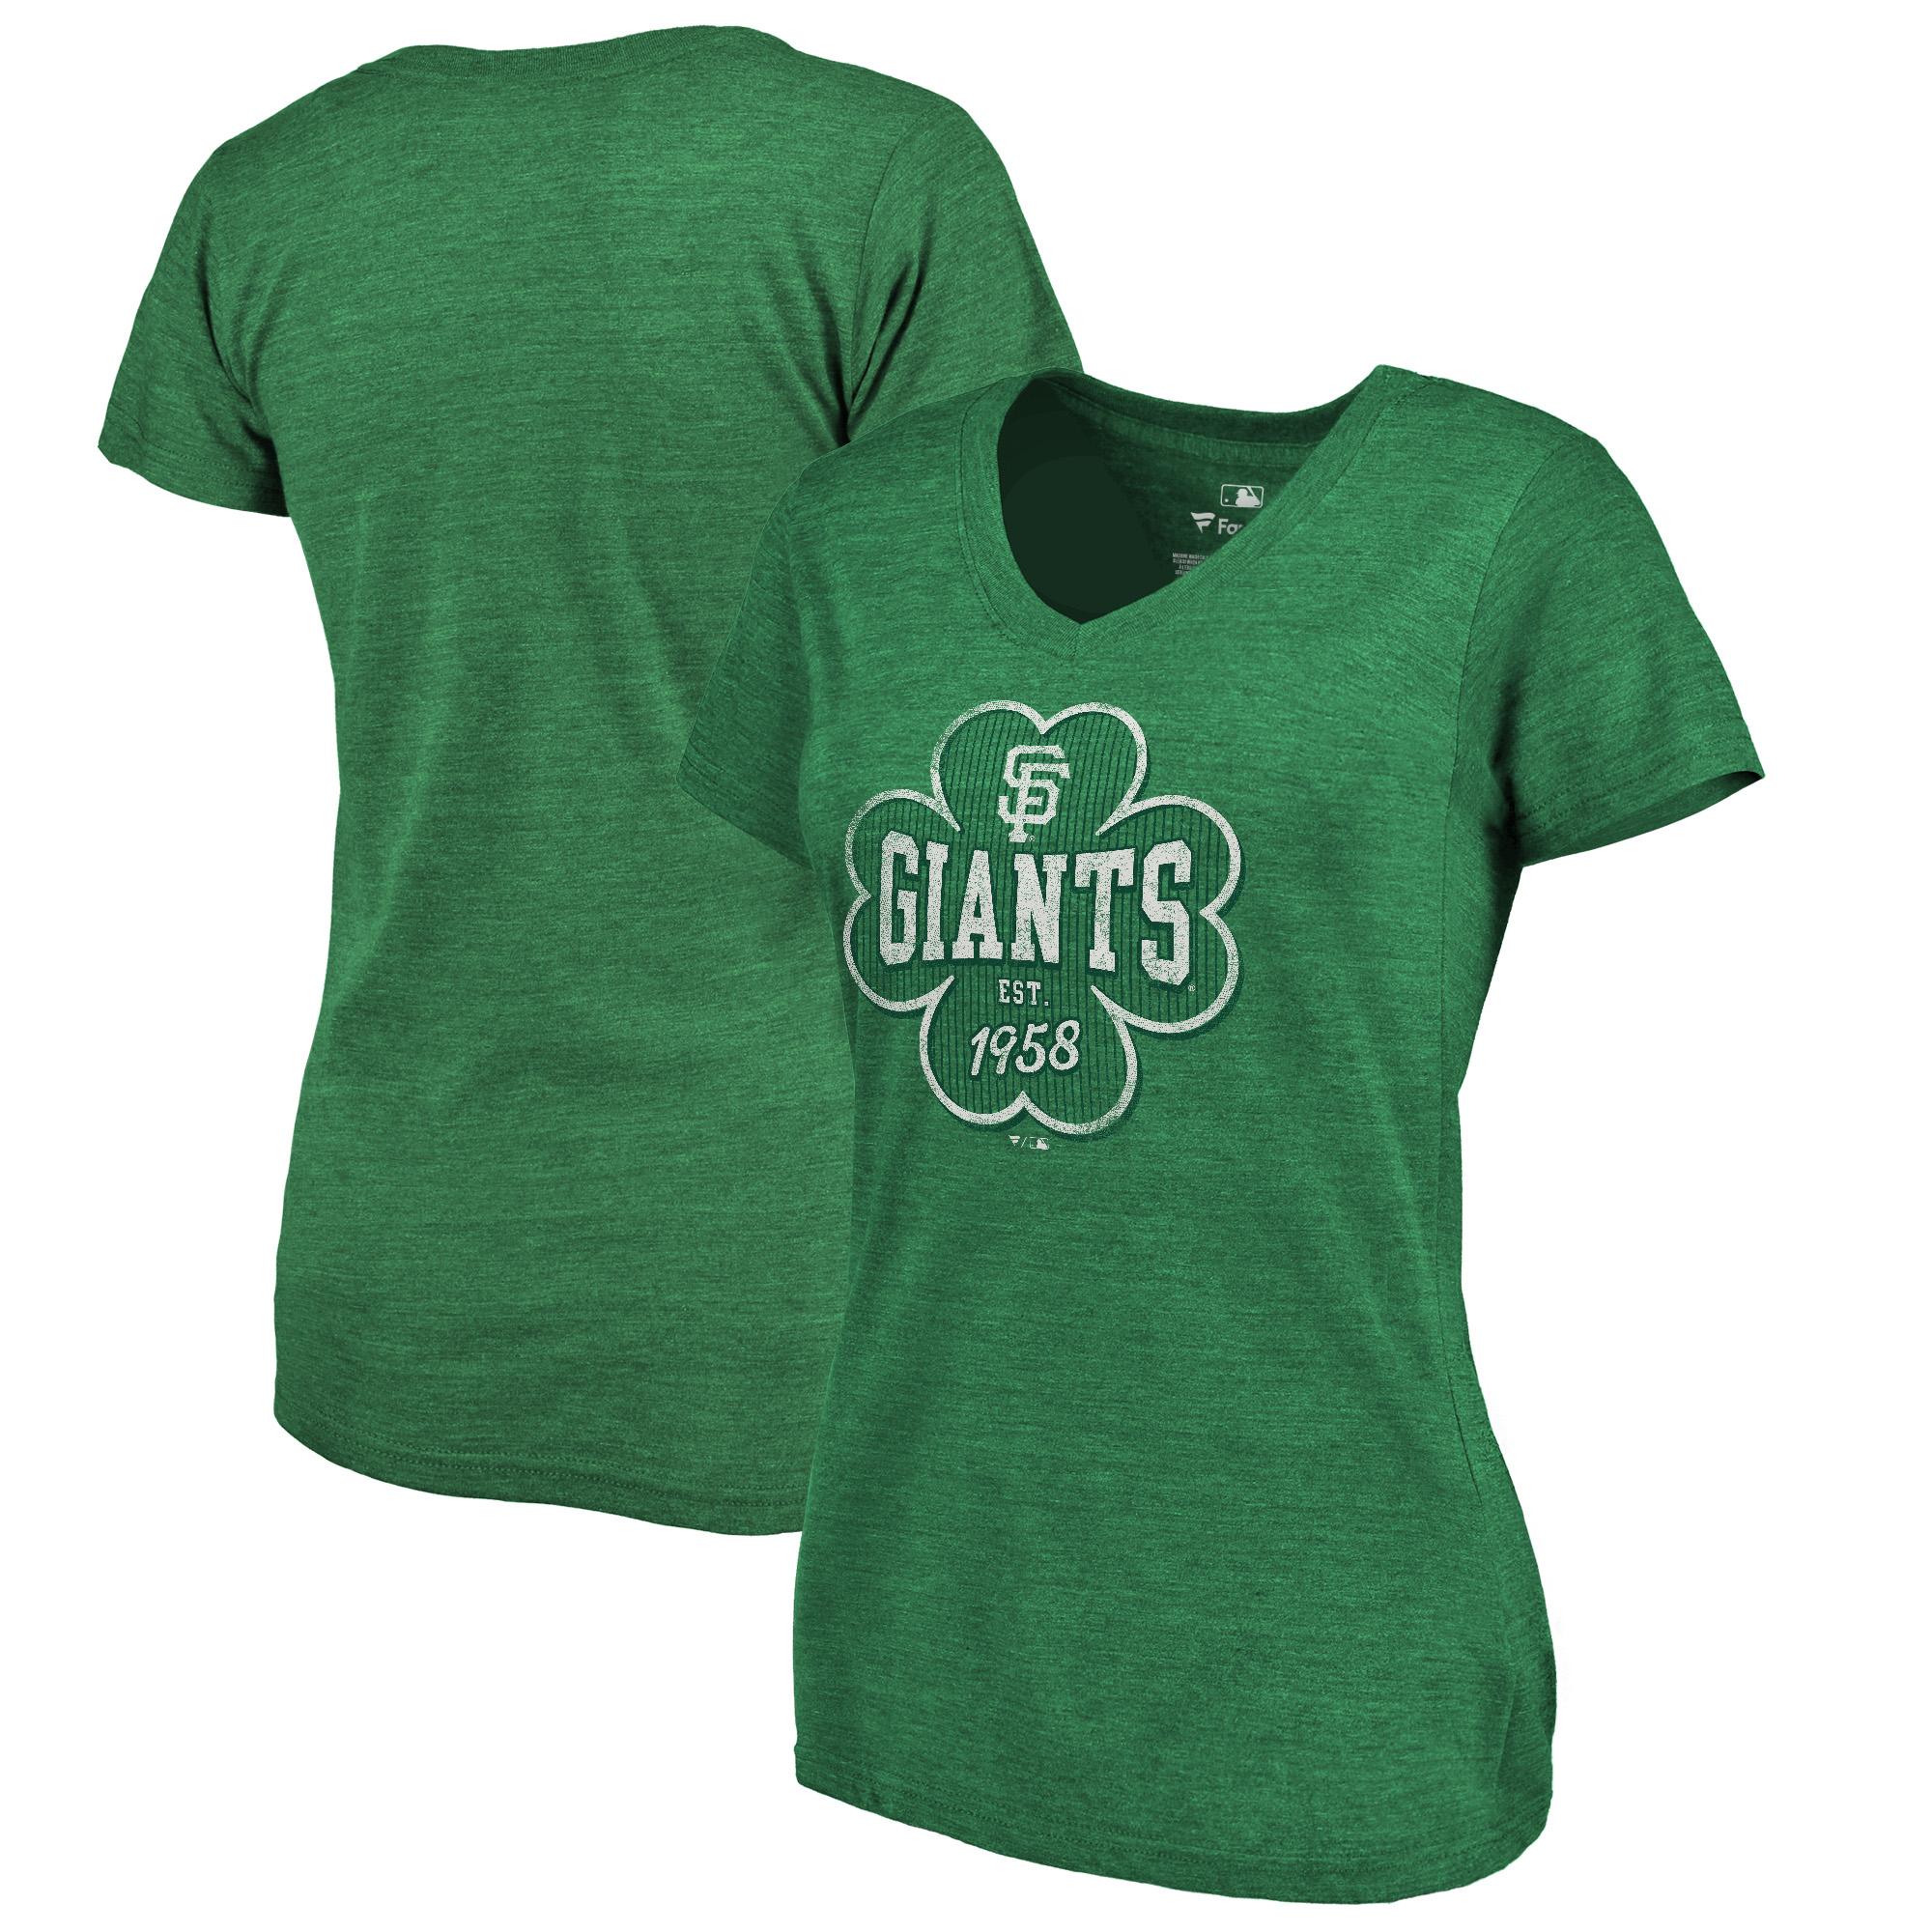 San Francisco Giants Fanatics Branded Women's 2018 St. Patrick's Day Emerald Isle Tri-Blend V-Neck T-Shirt - Heather Kelly Green